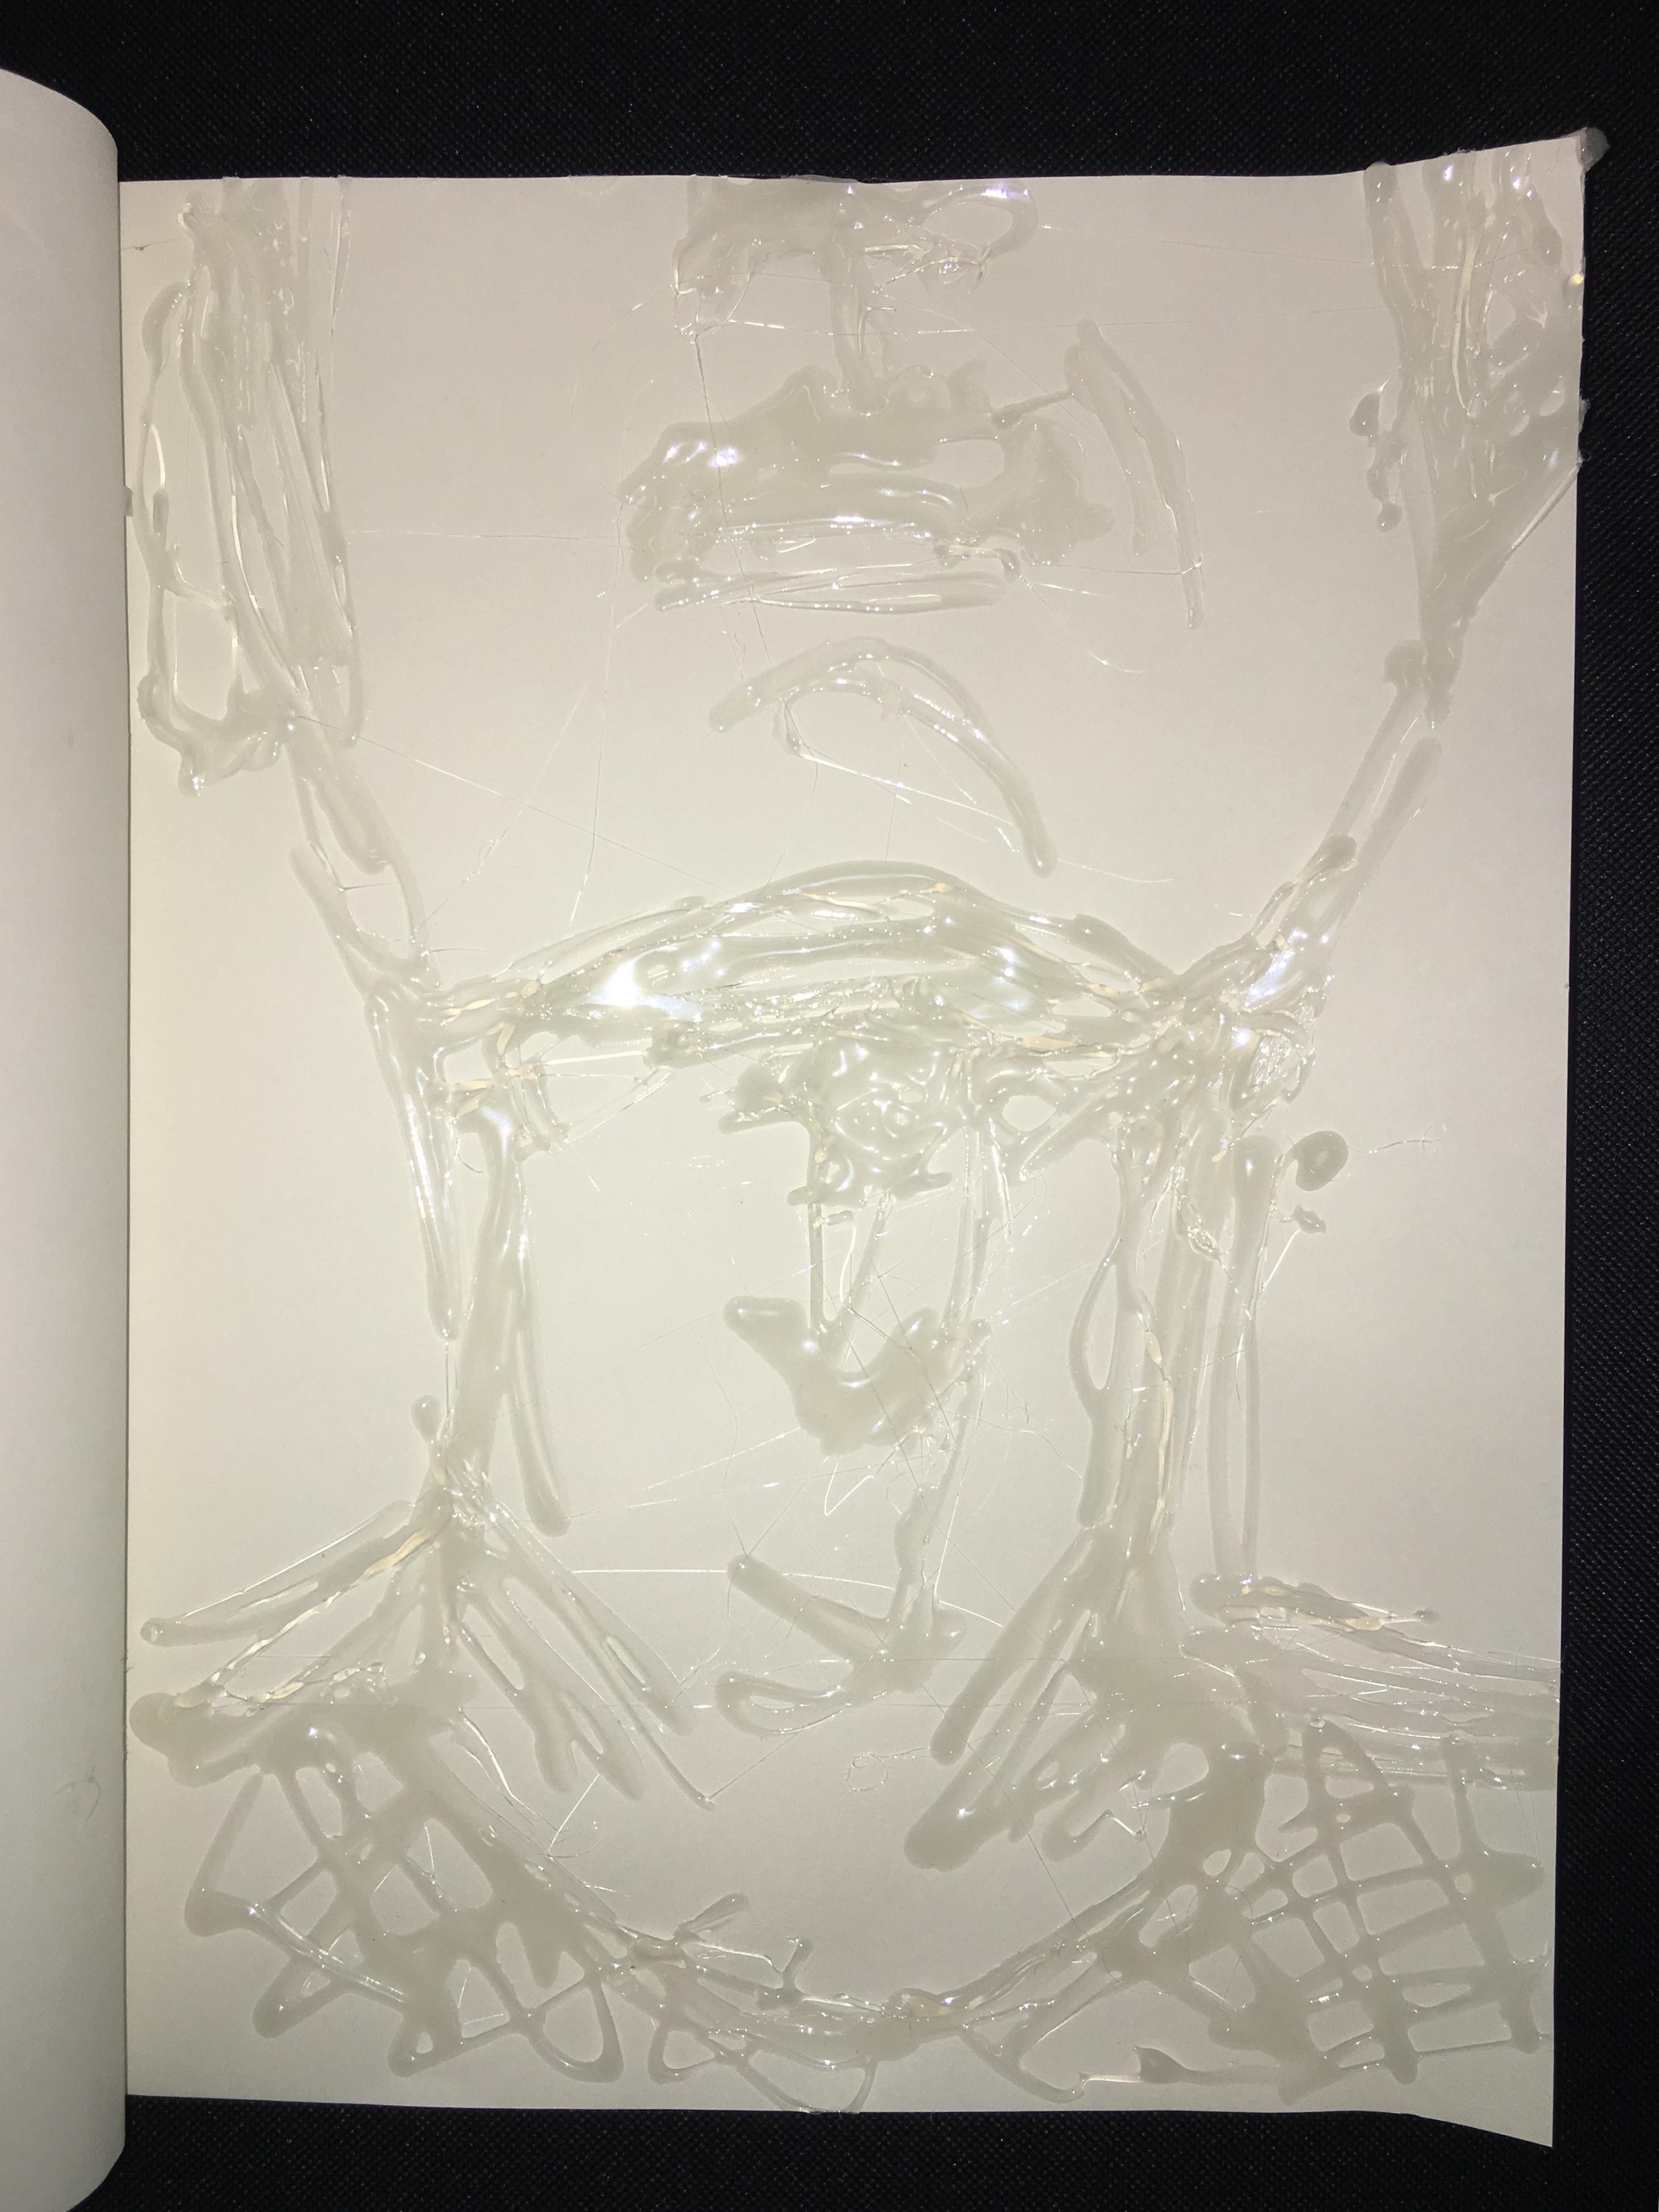 Experimental Drawing Tools: Hot Glue & Light